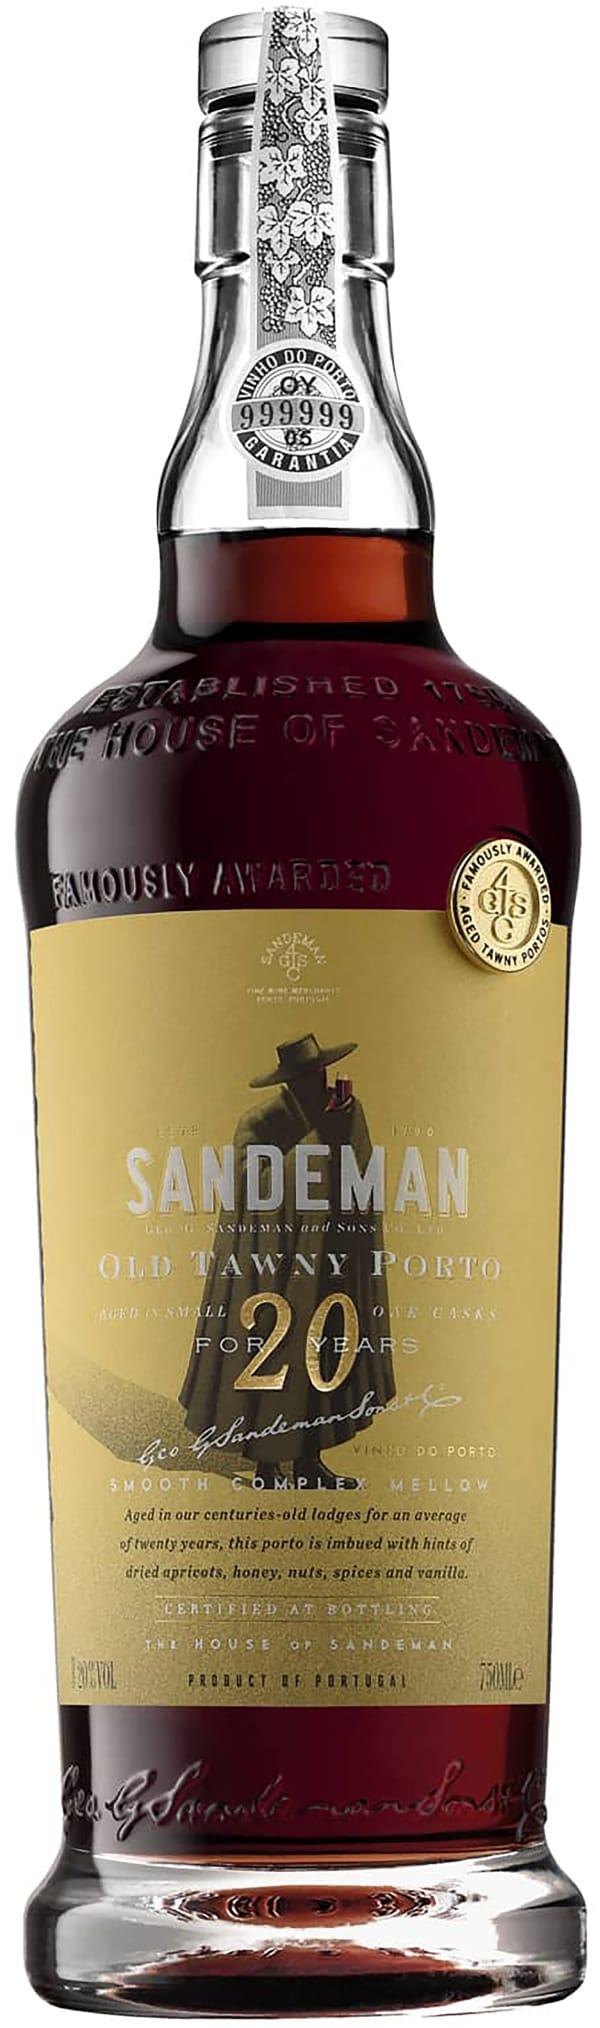 Sandeman 20 Years Old Tawny Port